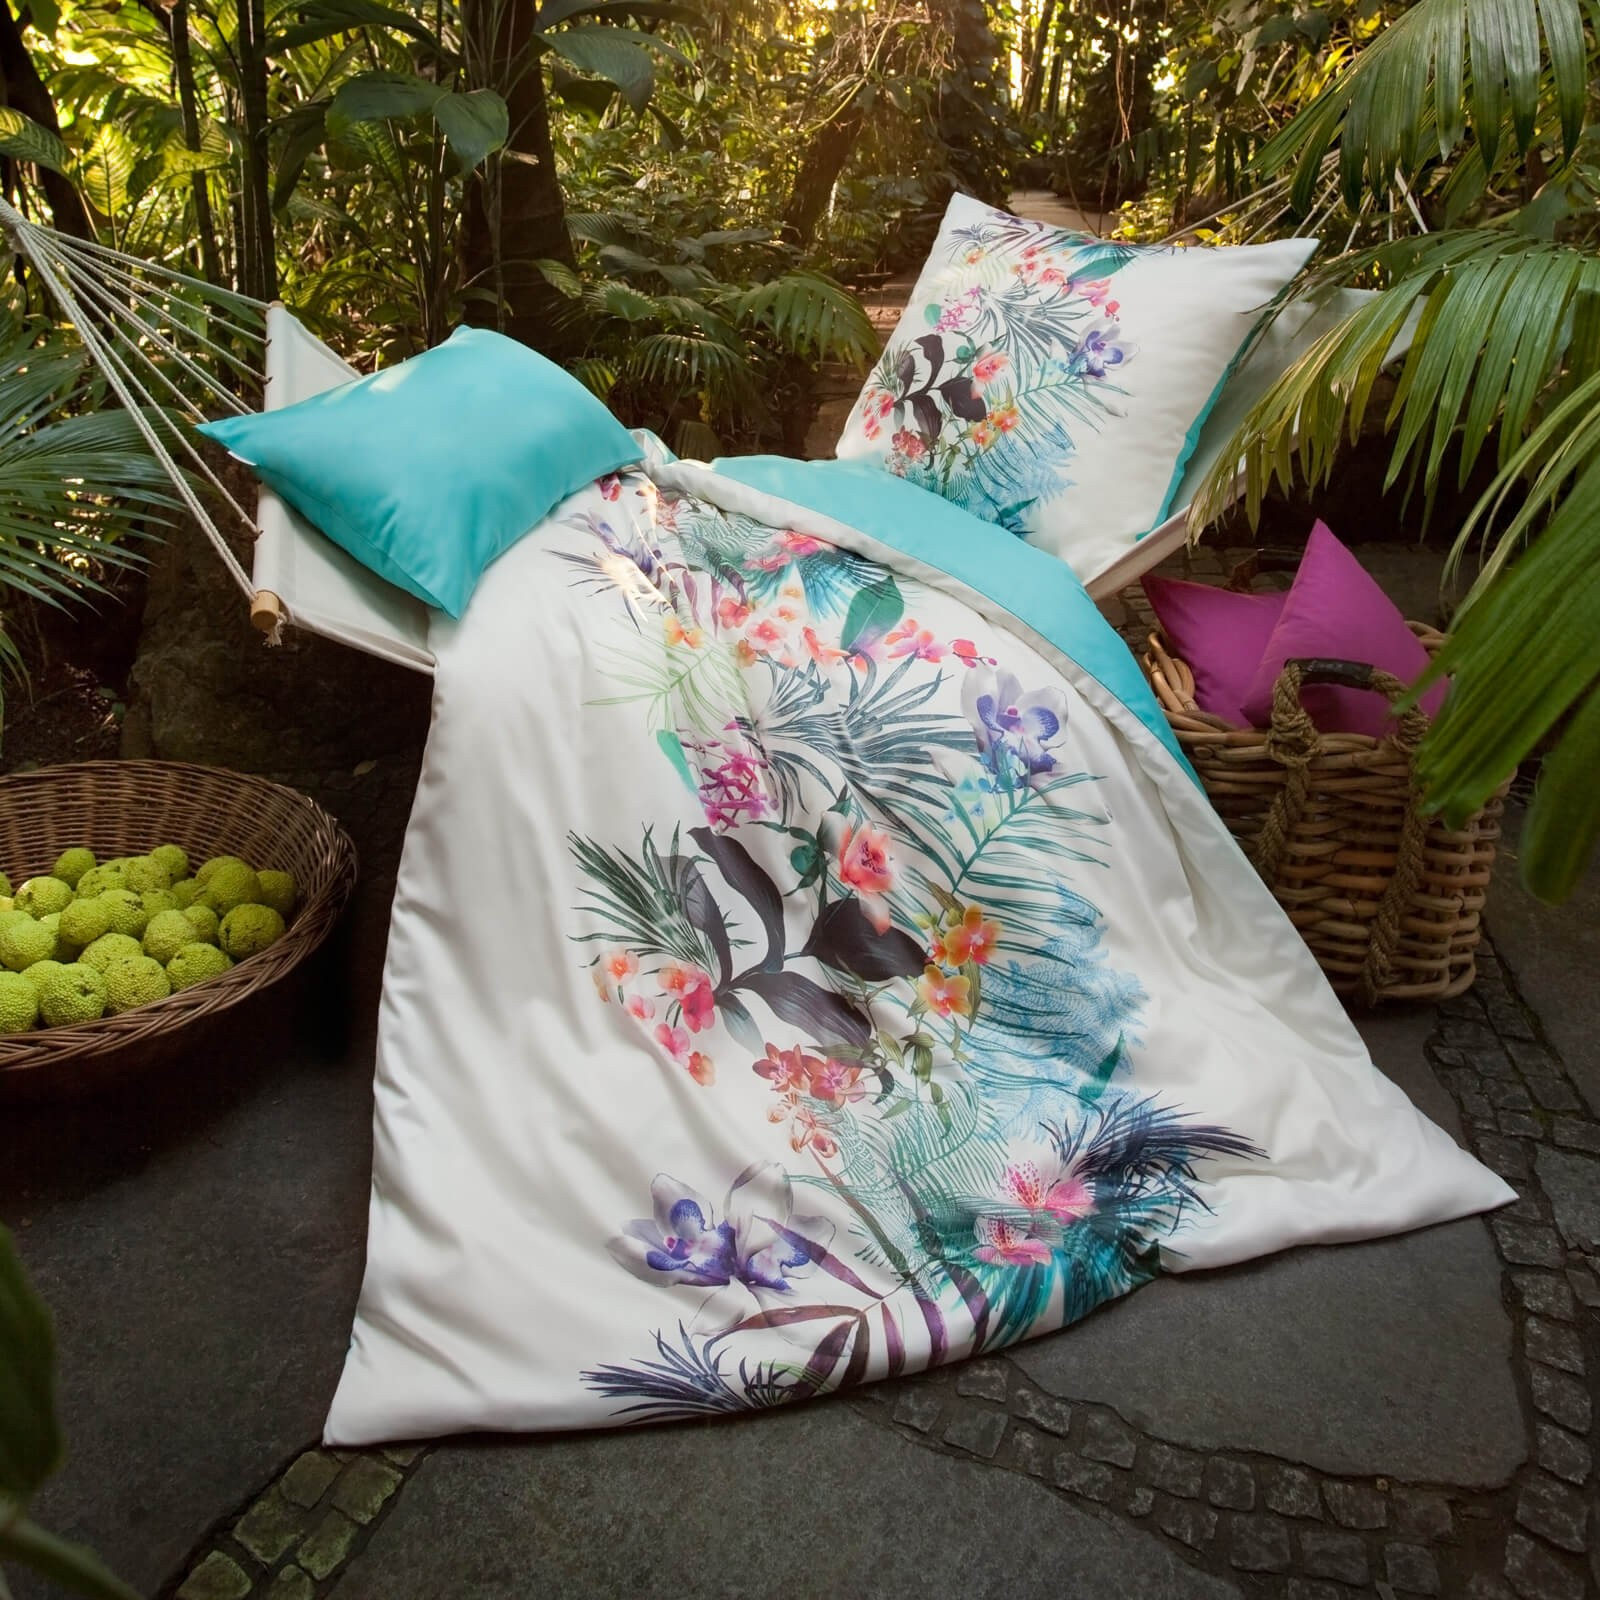 bettw sche estella elvana 7444 multicolor. Black Bedroom Furniture Sets. Home Design Ideas